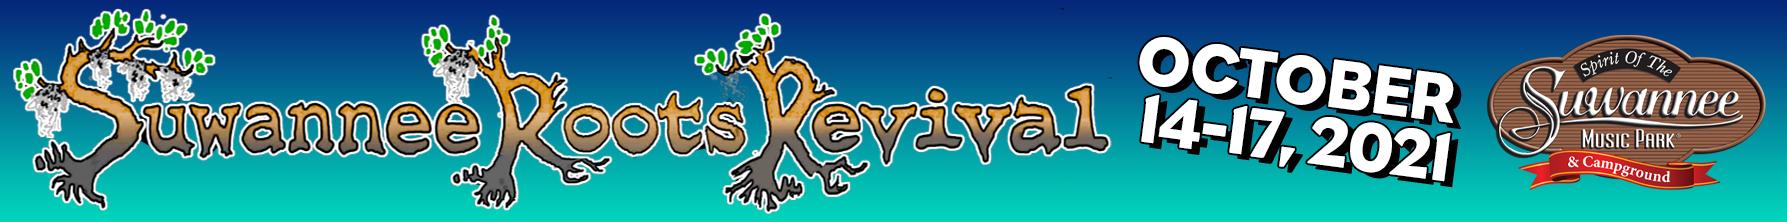 Suwannee Roots Revival™| Oct 14-17, 2021